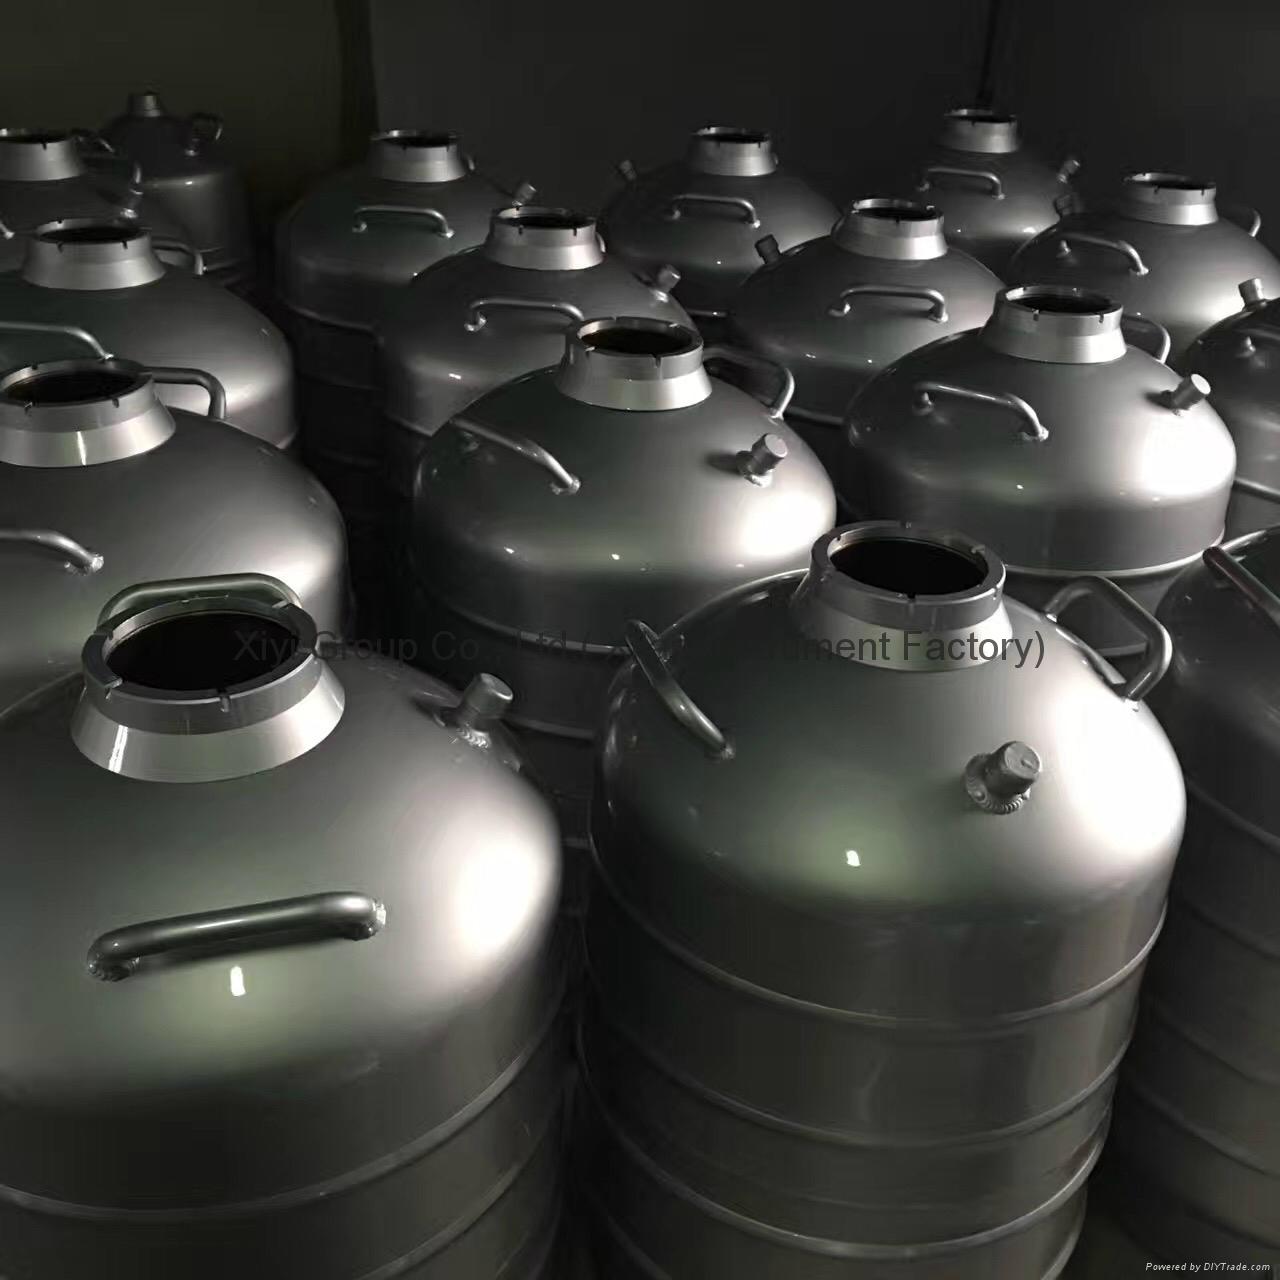 New 35L Cryogenic Container Liquid Nitrogen LN2 Dewar Tank w/ Straps 5